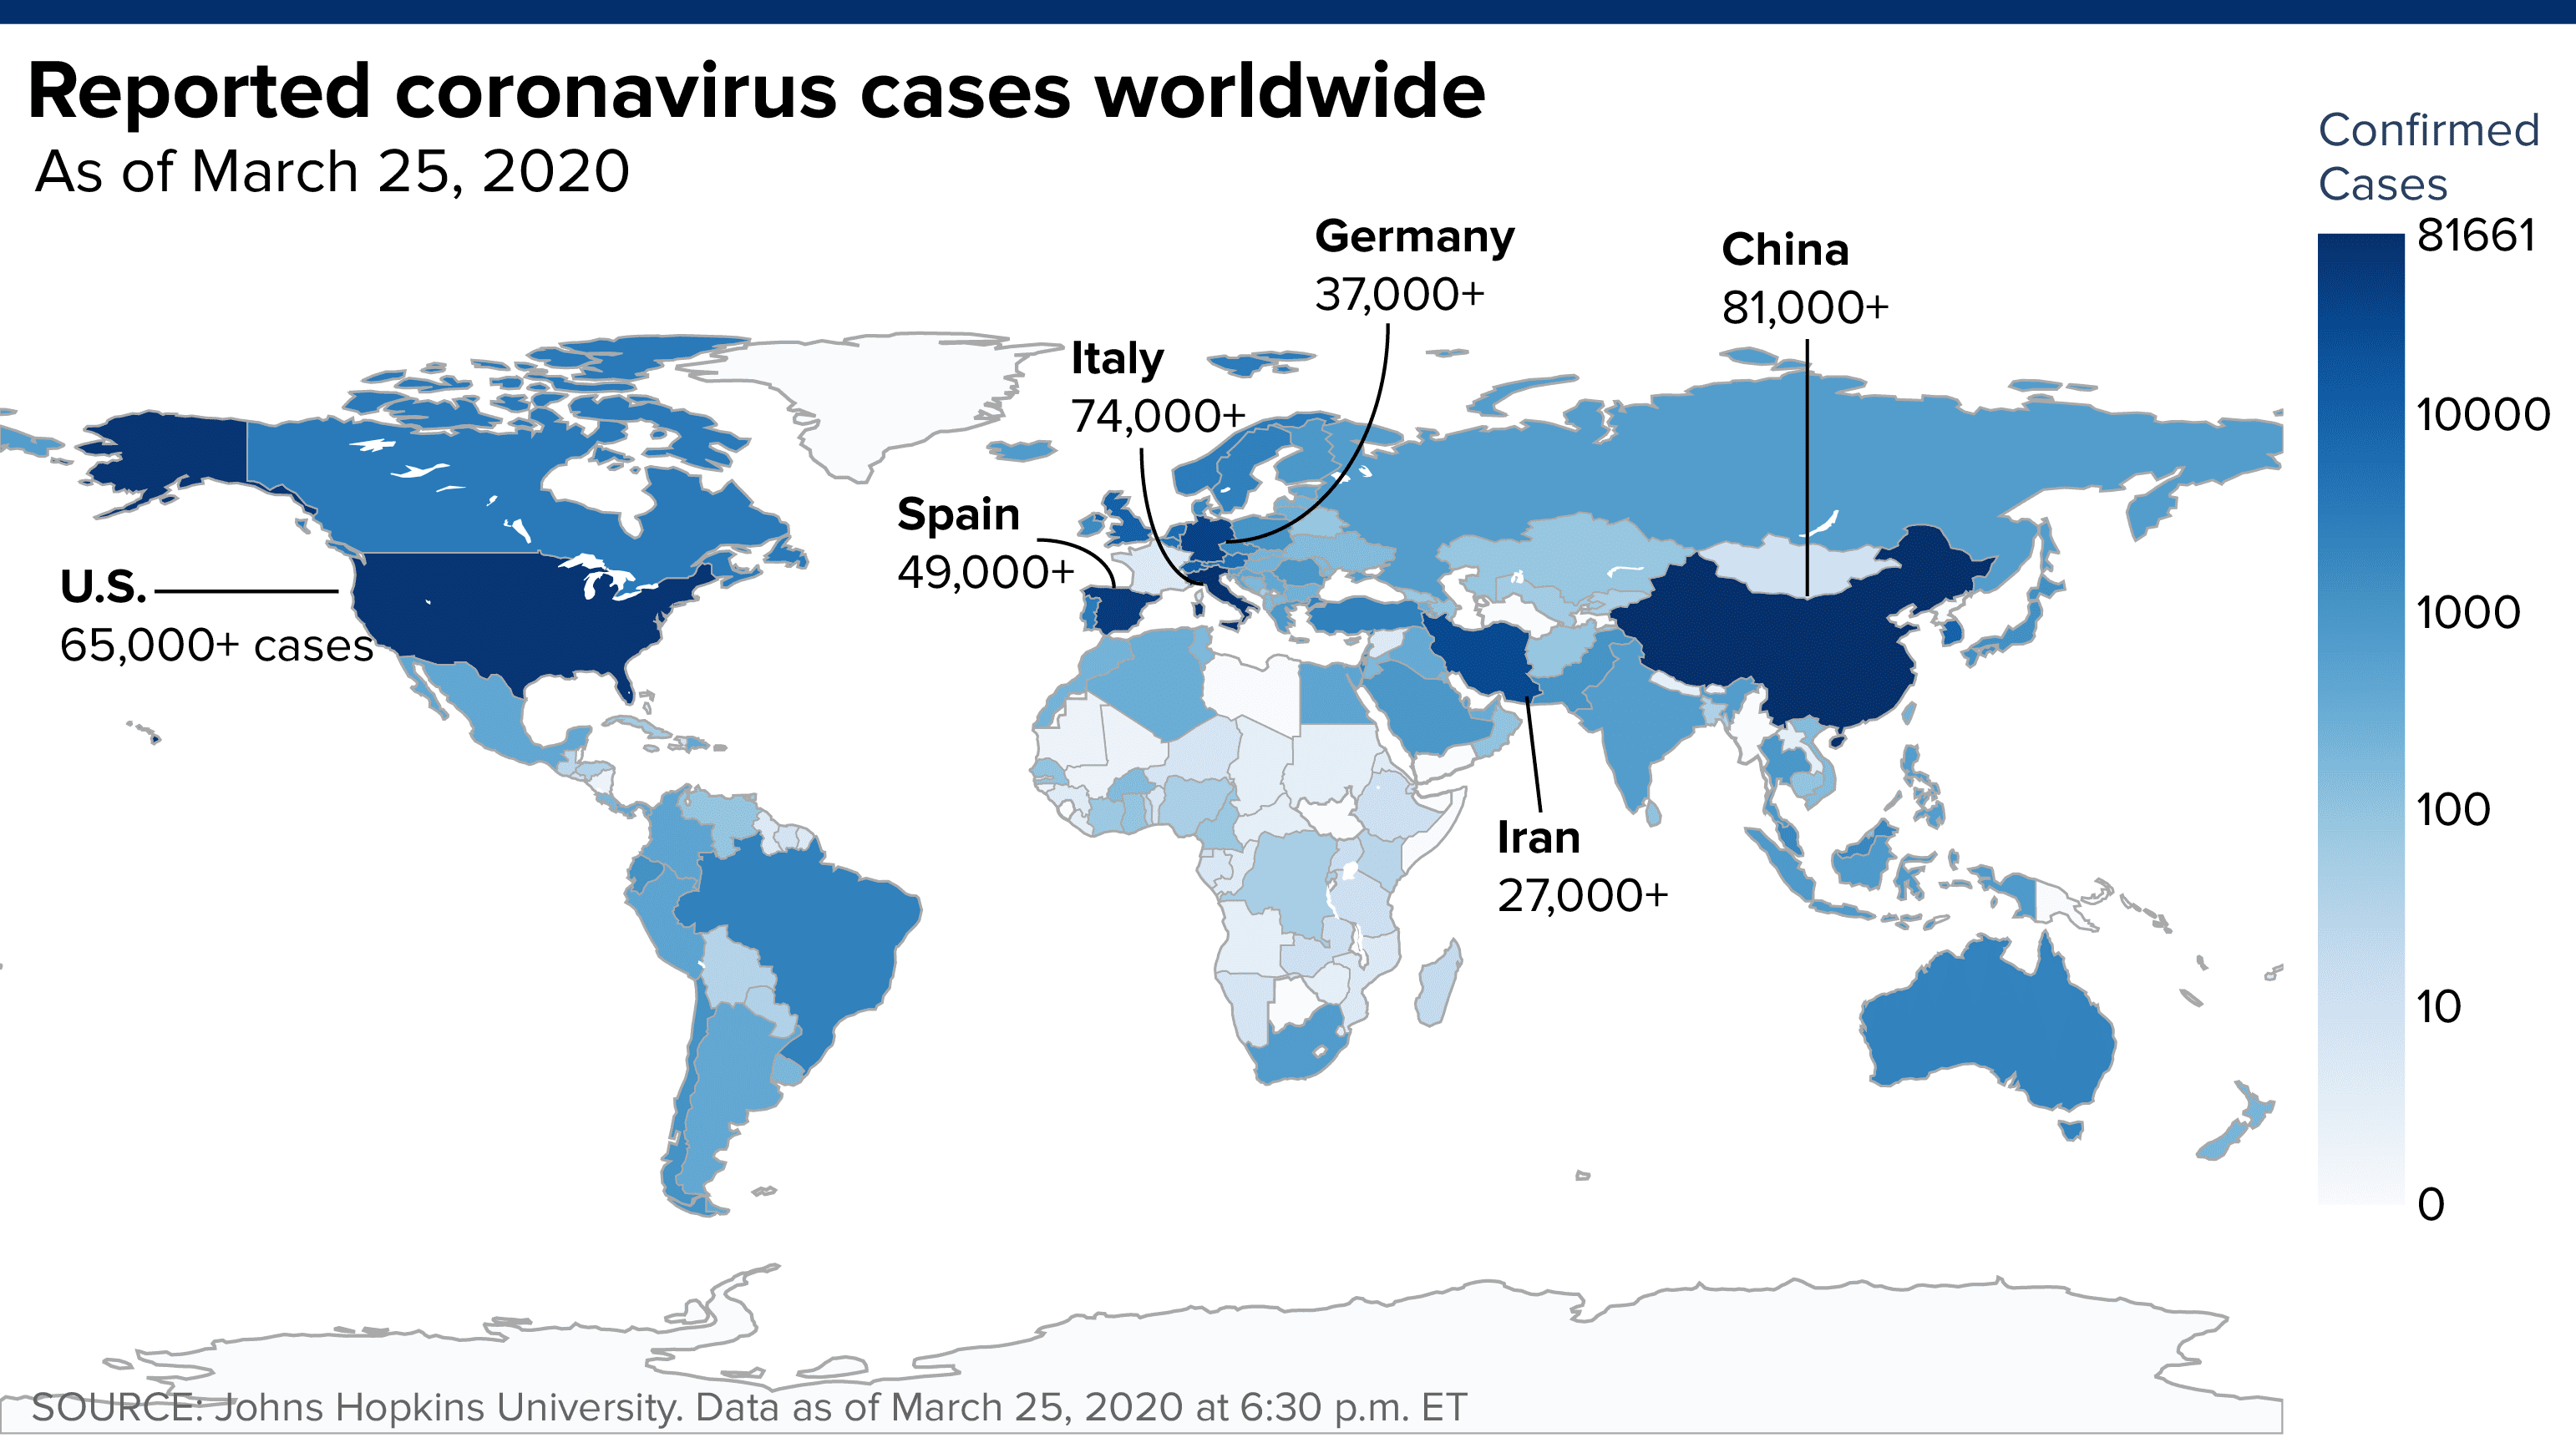 Worldwide coronavirus cases top 500,000, doubling in just over a week